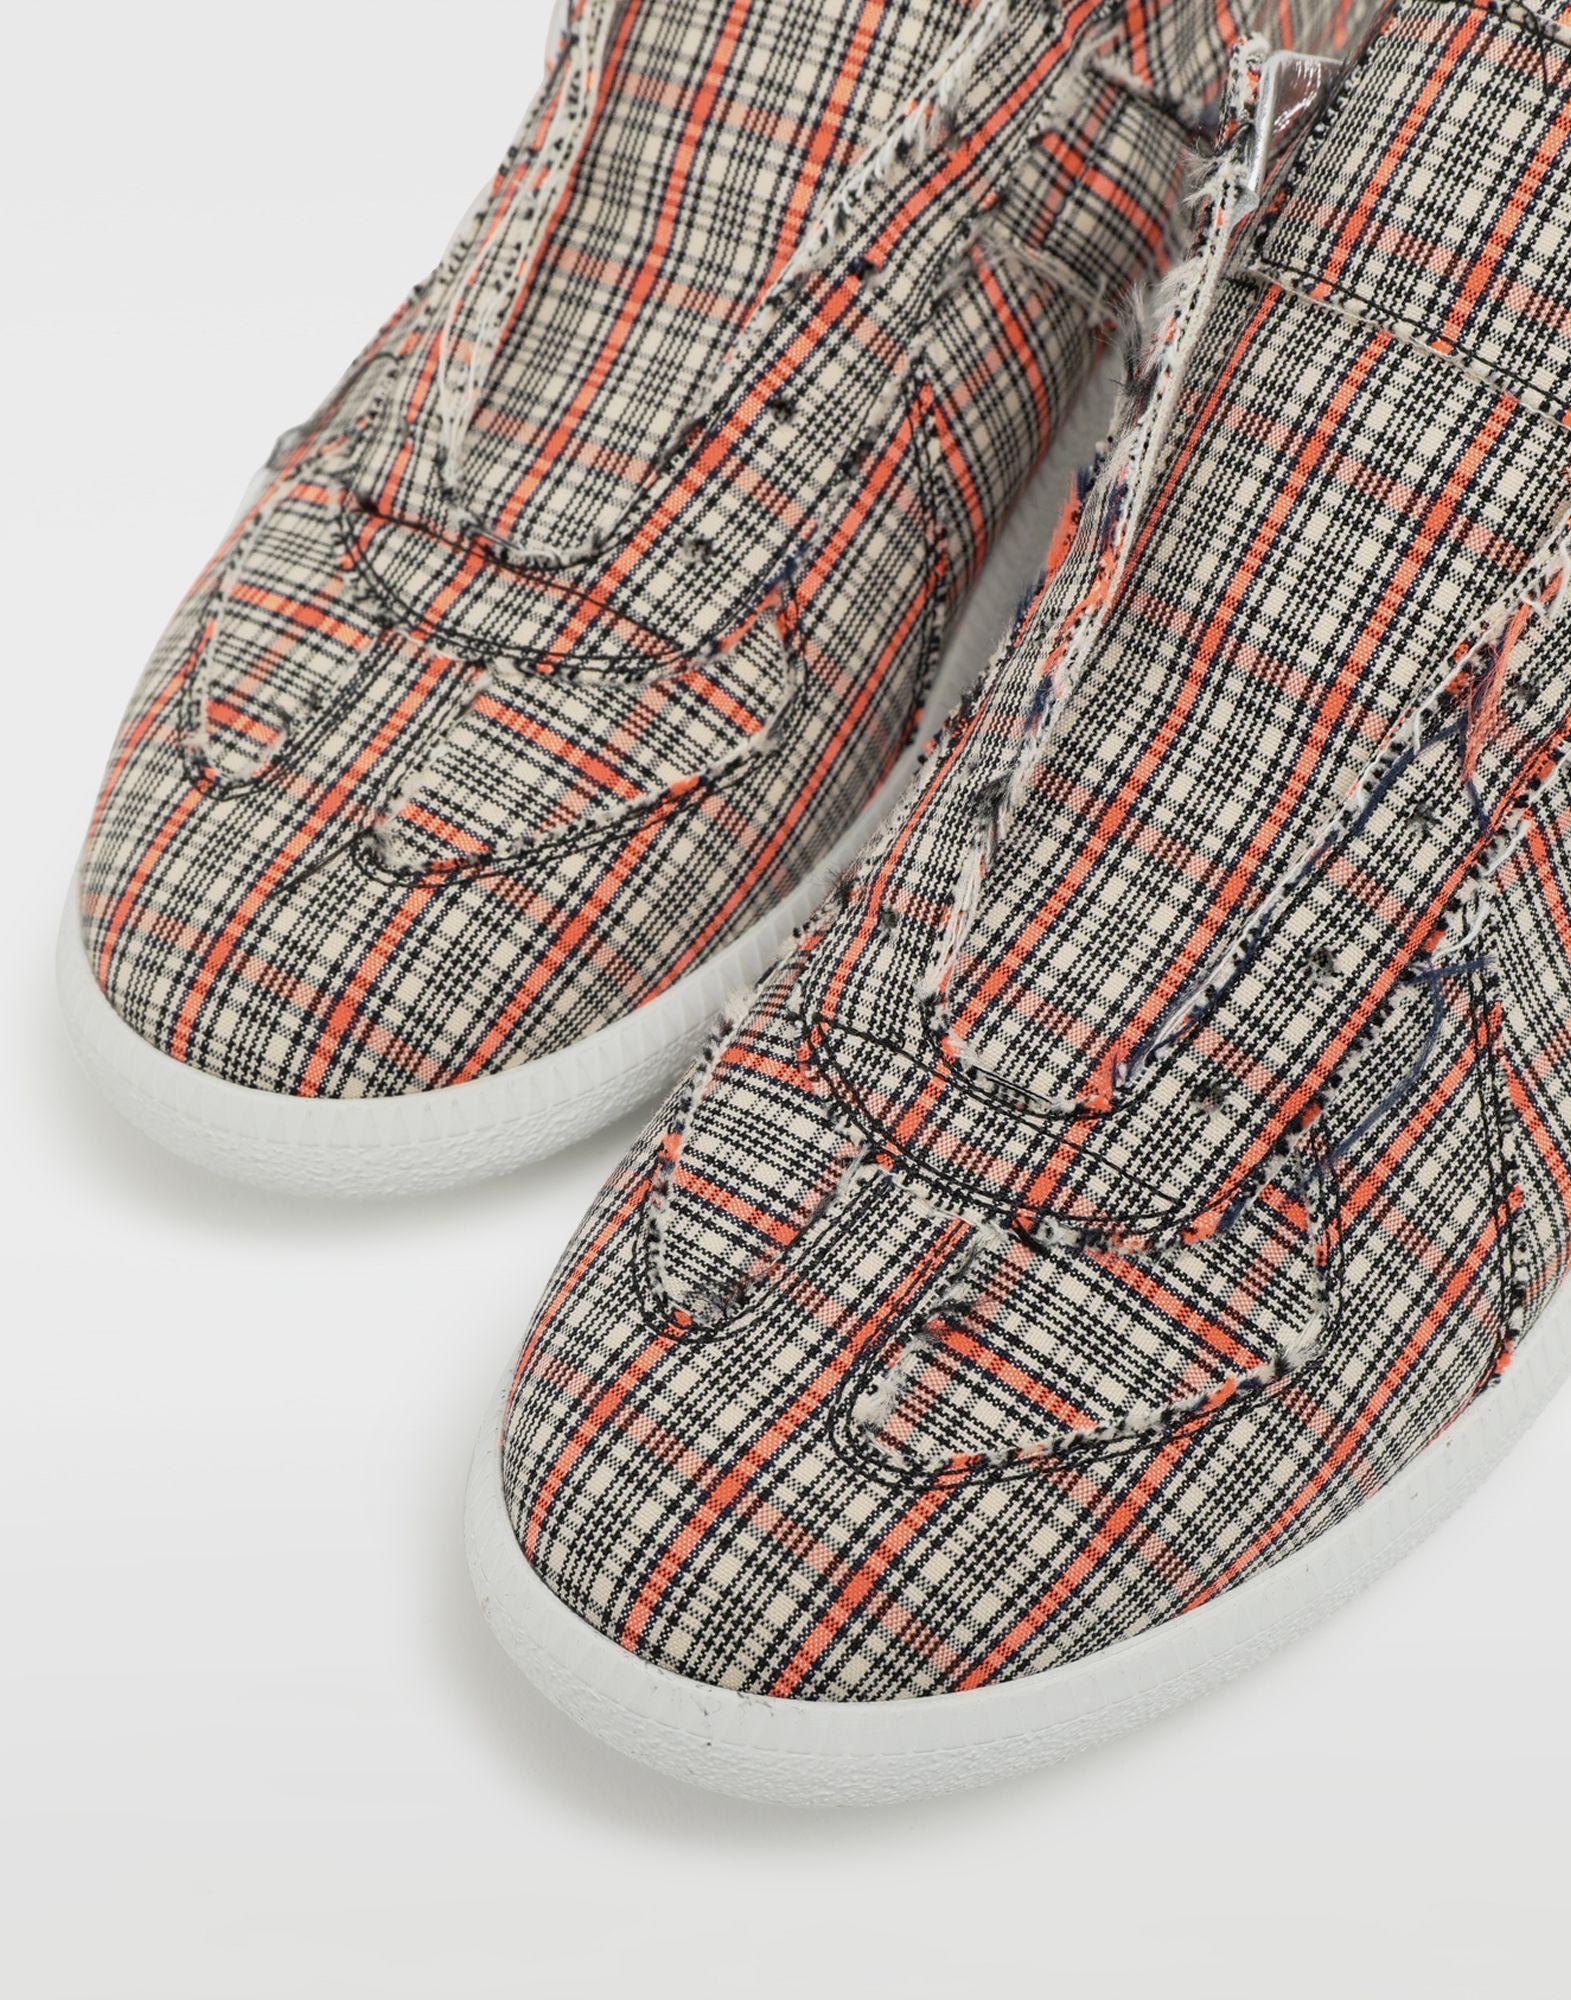 MAISON MARGIELA Replica low top check sneakers Sneakers Man e